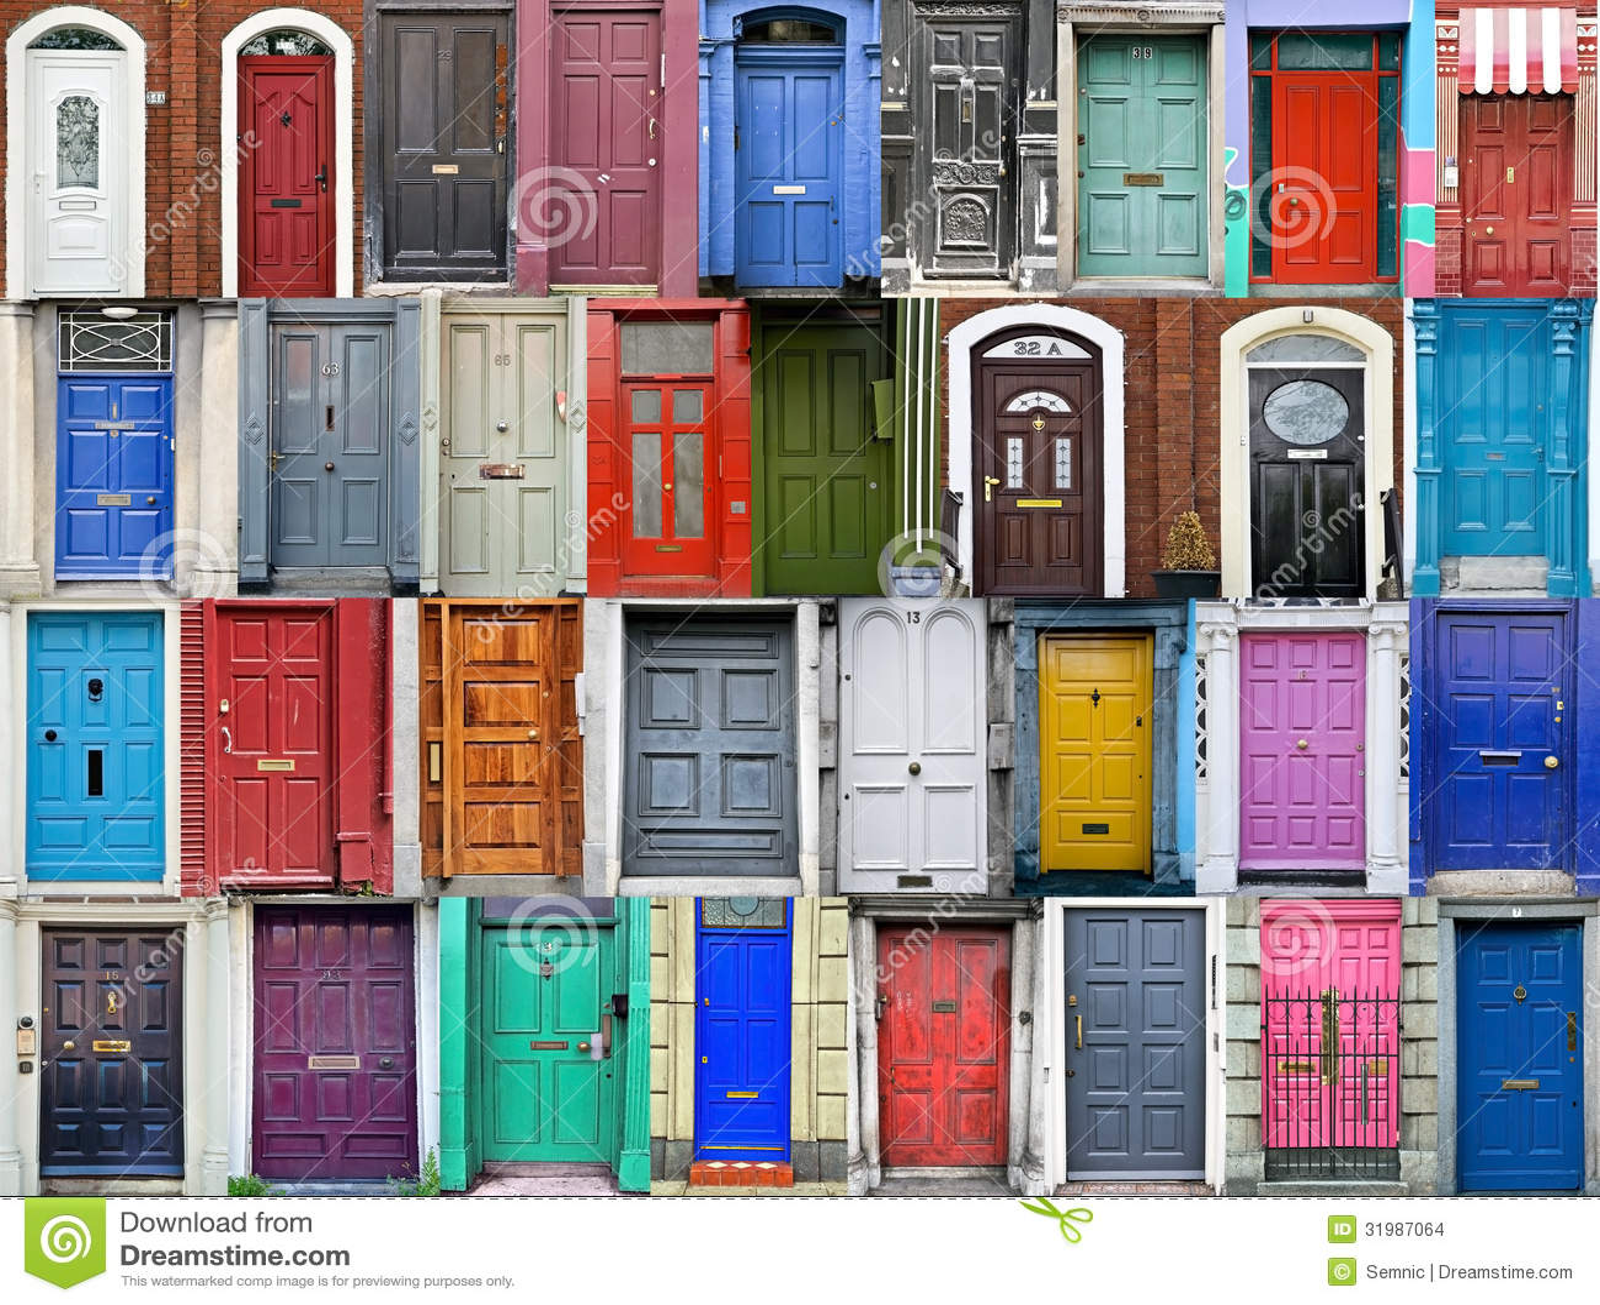 Doors of Dublin Ireland  sc 1 st  Dreamstime.com & Doors of Dublin Ireland stock photo. Image of historic - 31987064